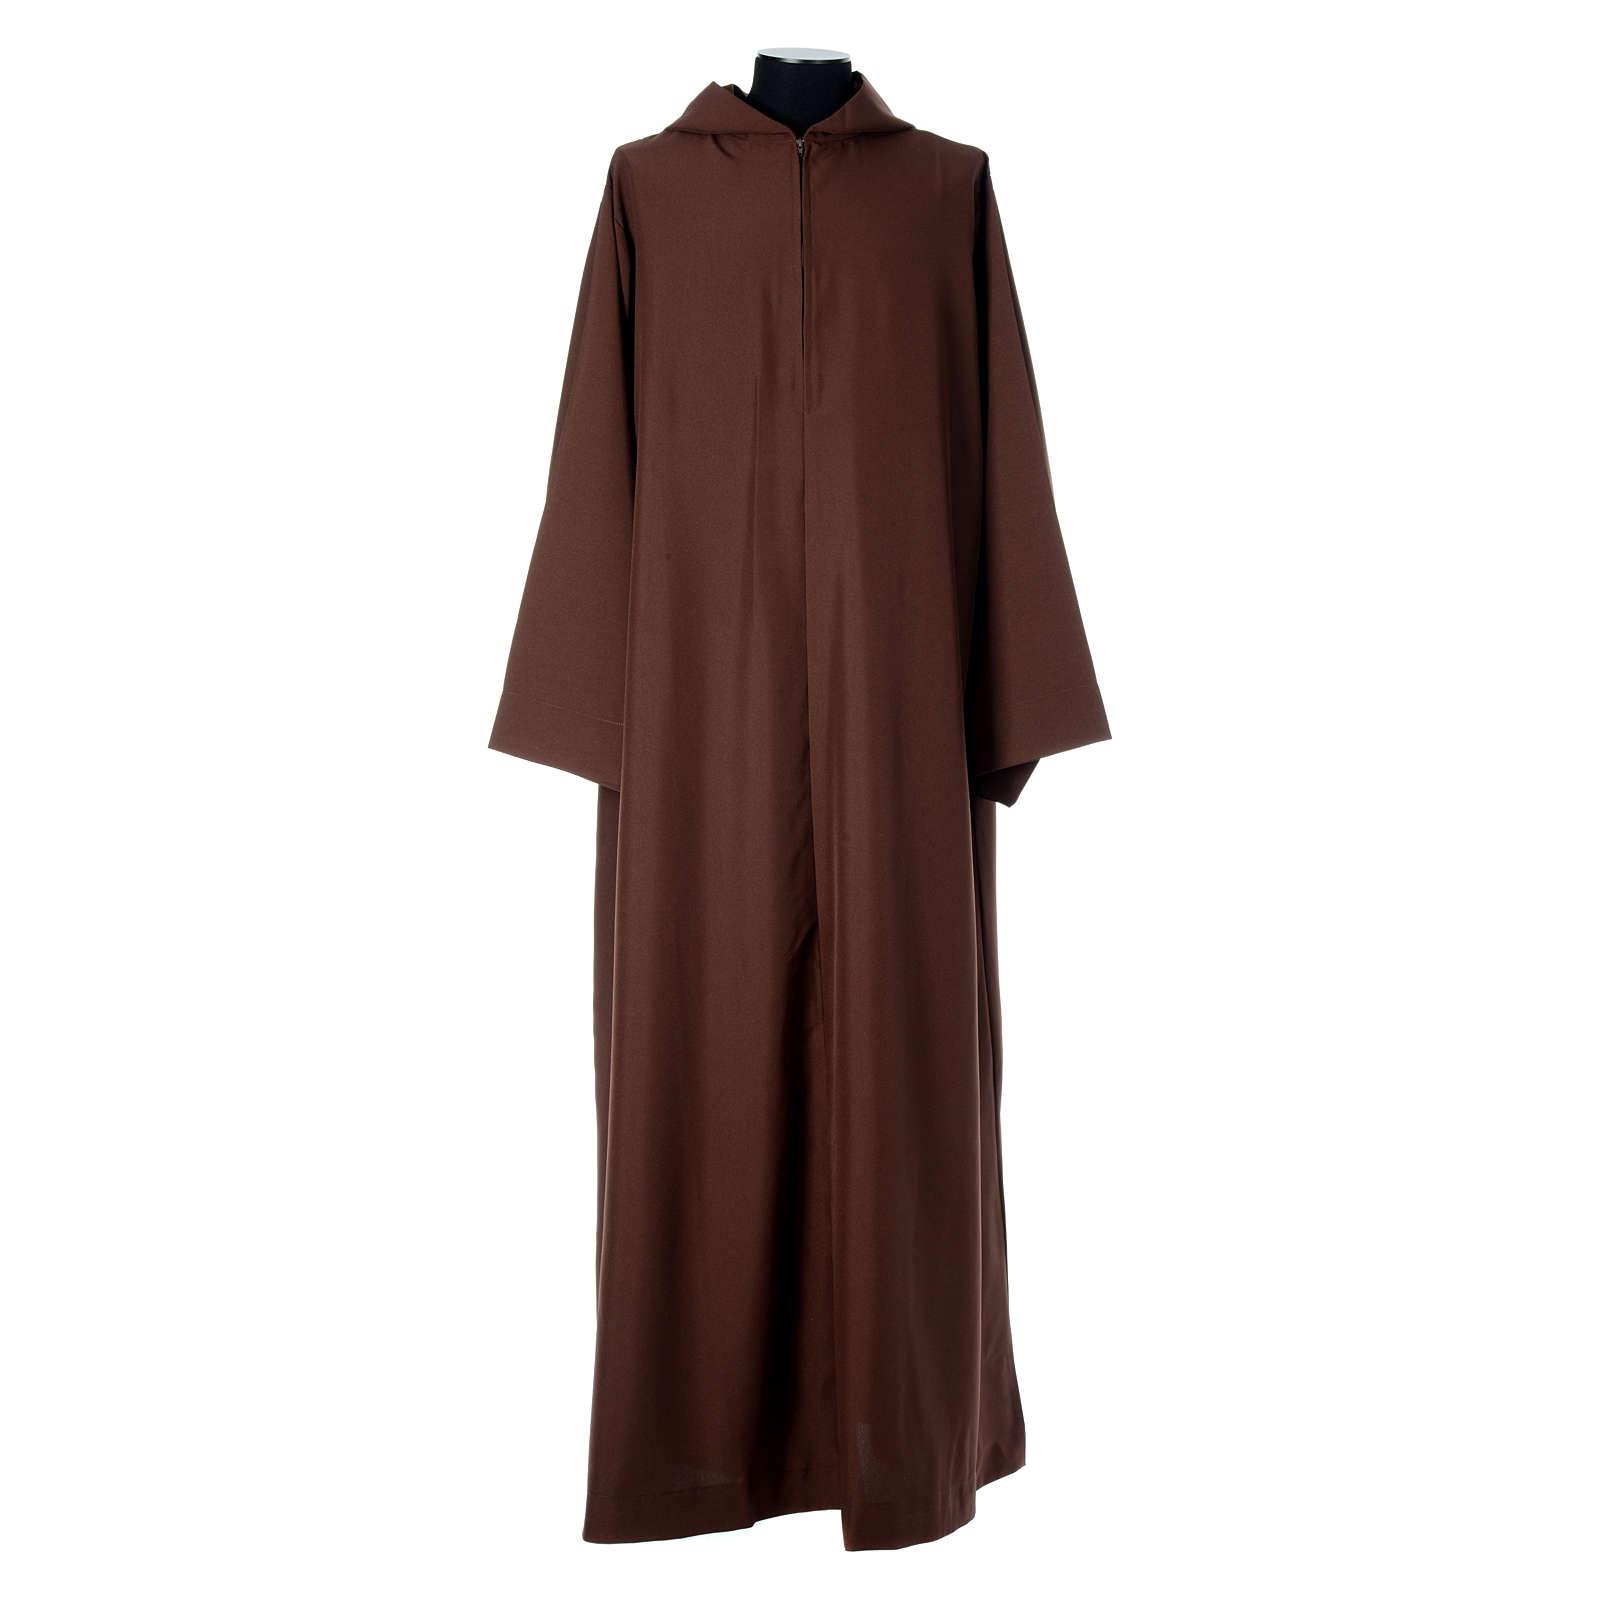 Saio francescano con mantella marrone poliestere 4